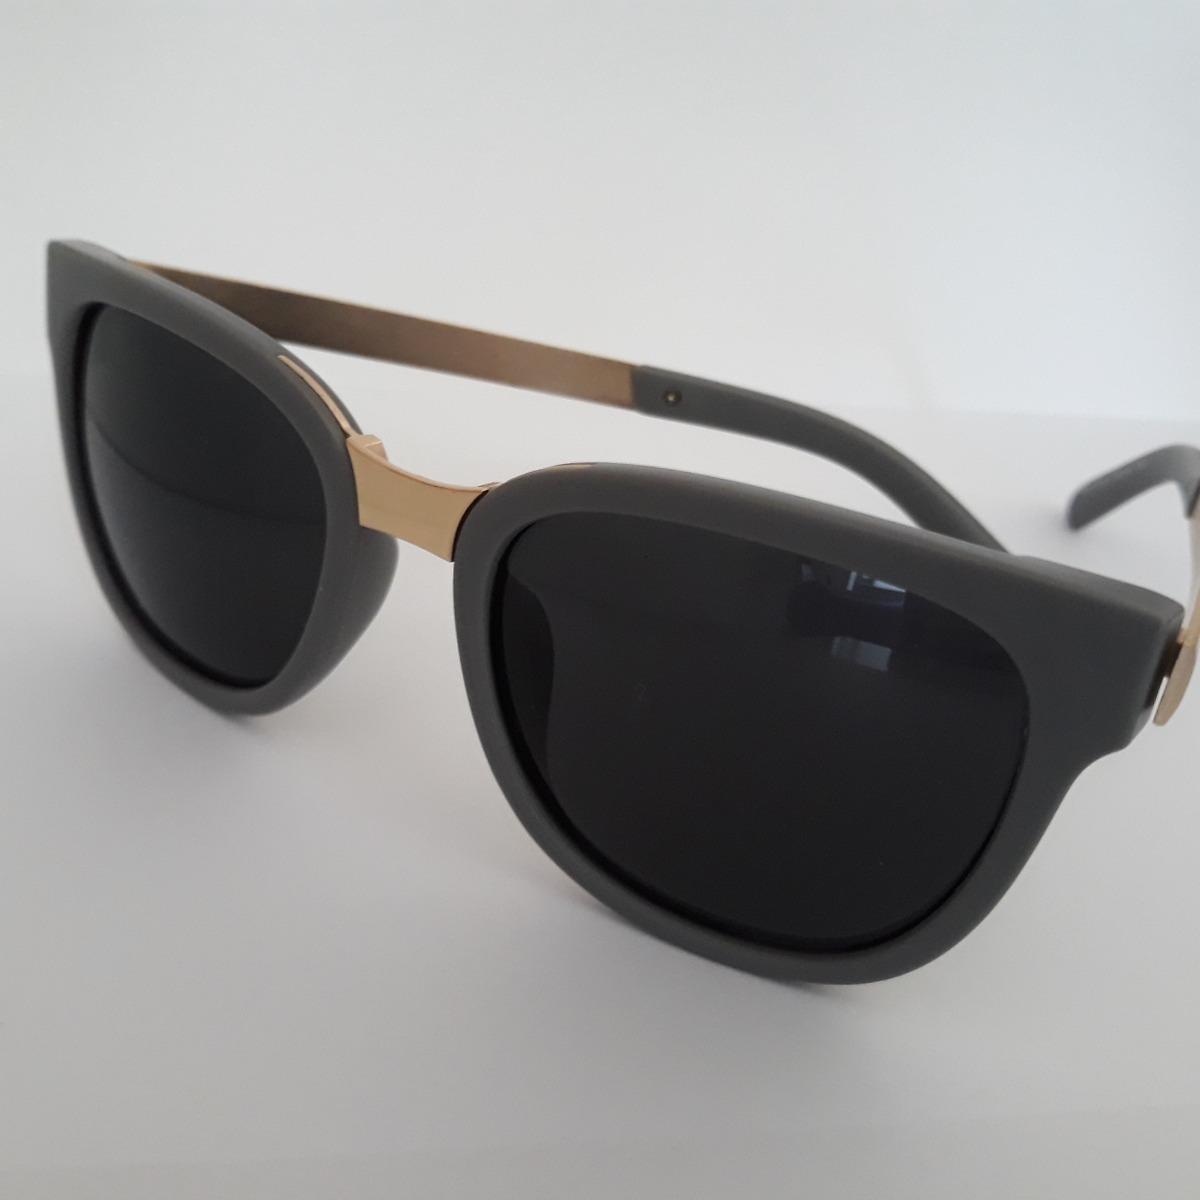 2cfc135c7bf55 Óculos De Sol Feminino Polarizado Uv400 Baviron    barato    - R  89 ...